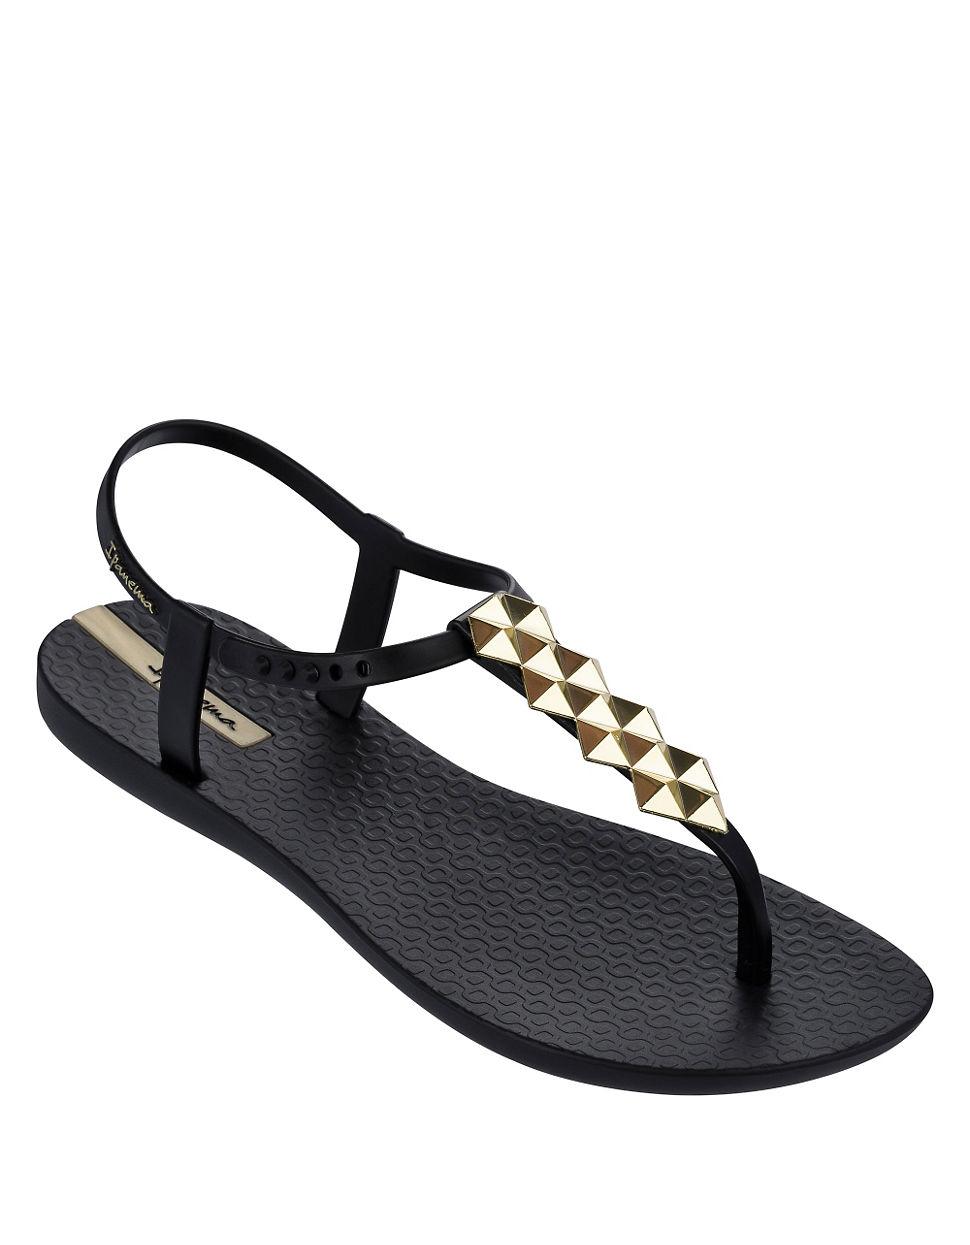 5cee87498a1 Ipanema Cleo Shine T-strap Sandals in Metallic - Lyst